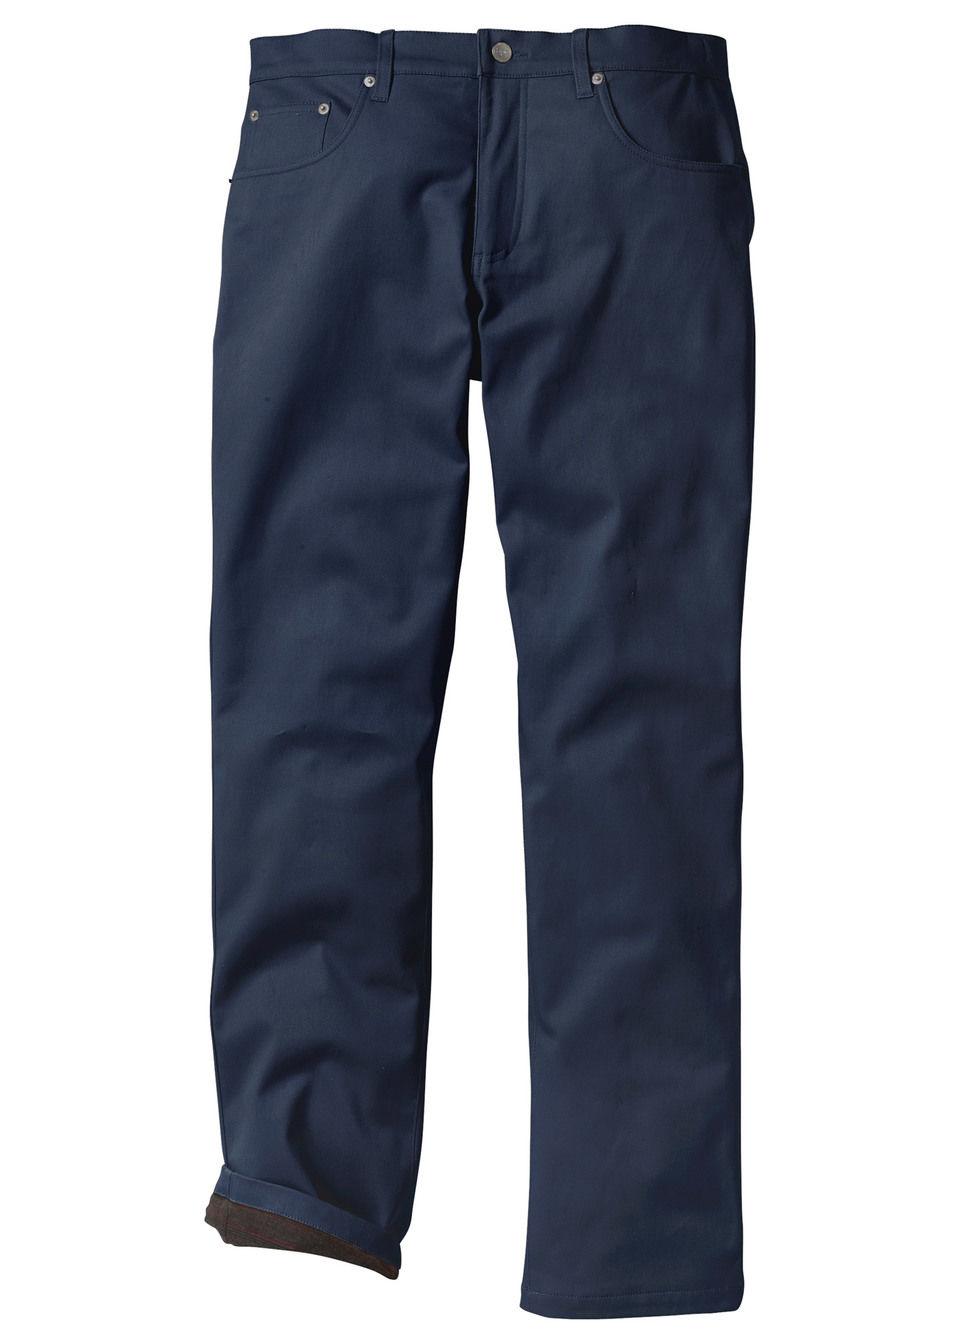 Pantaloni termo stretch bonprix